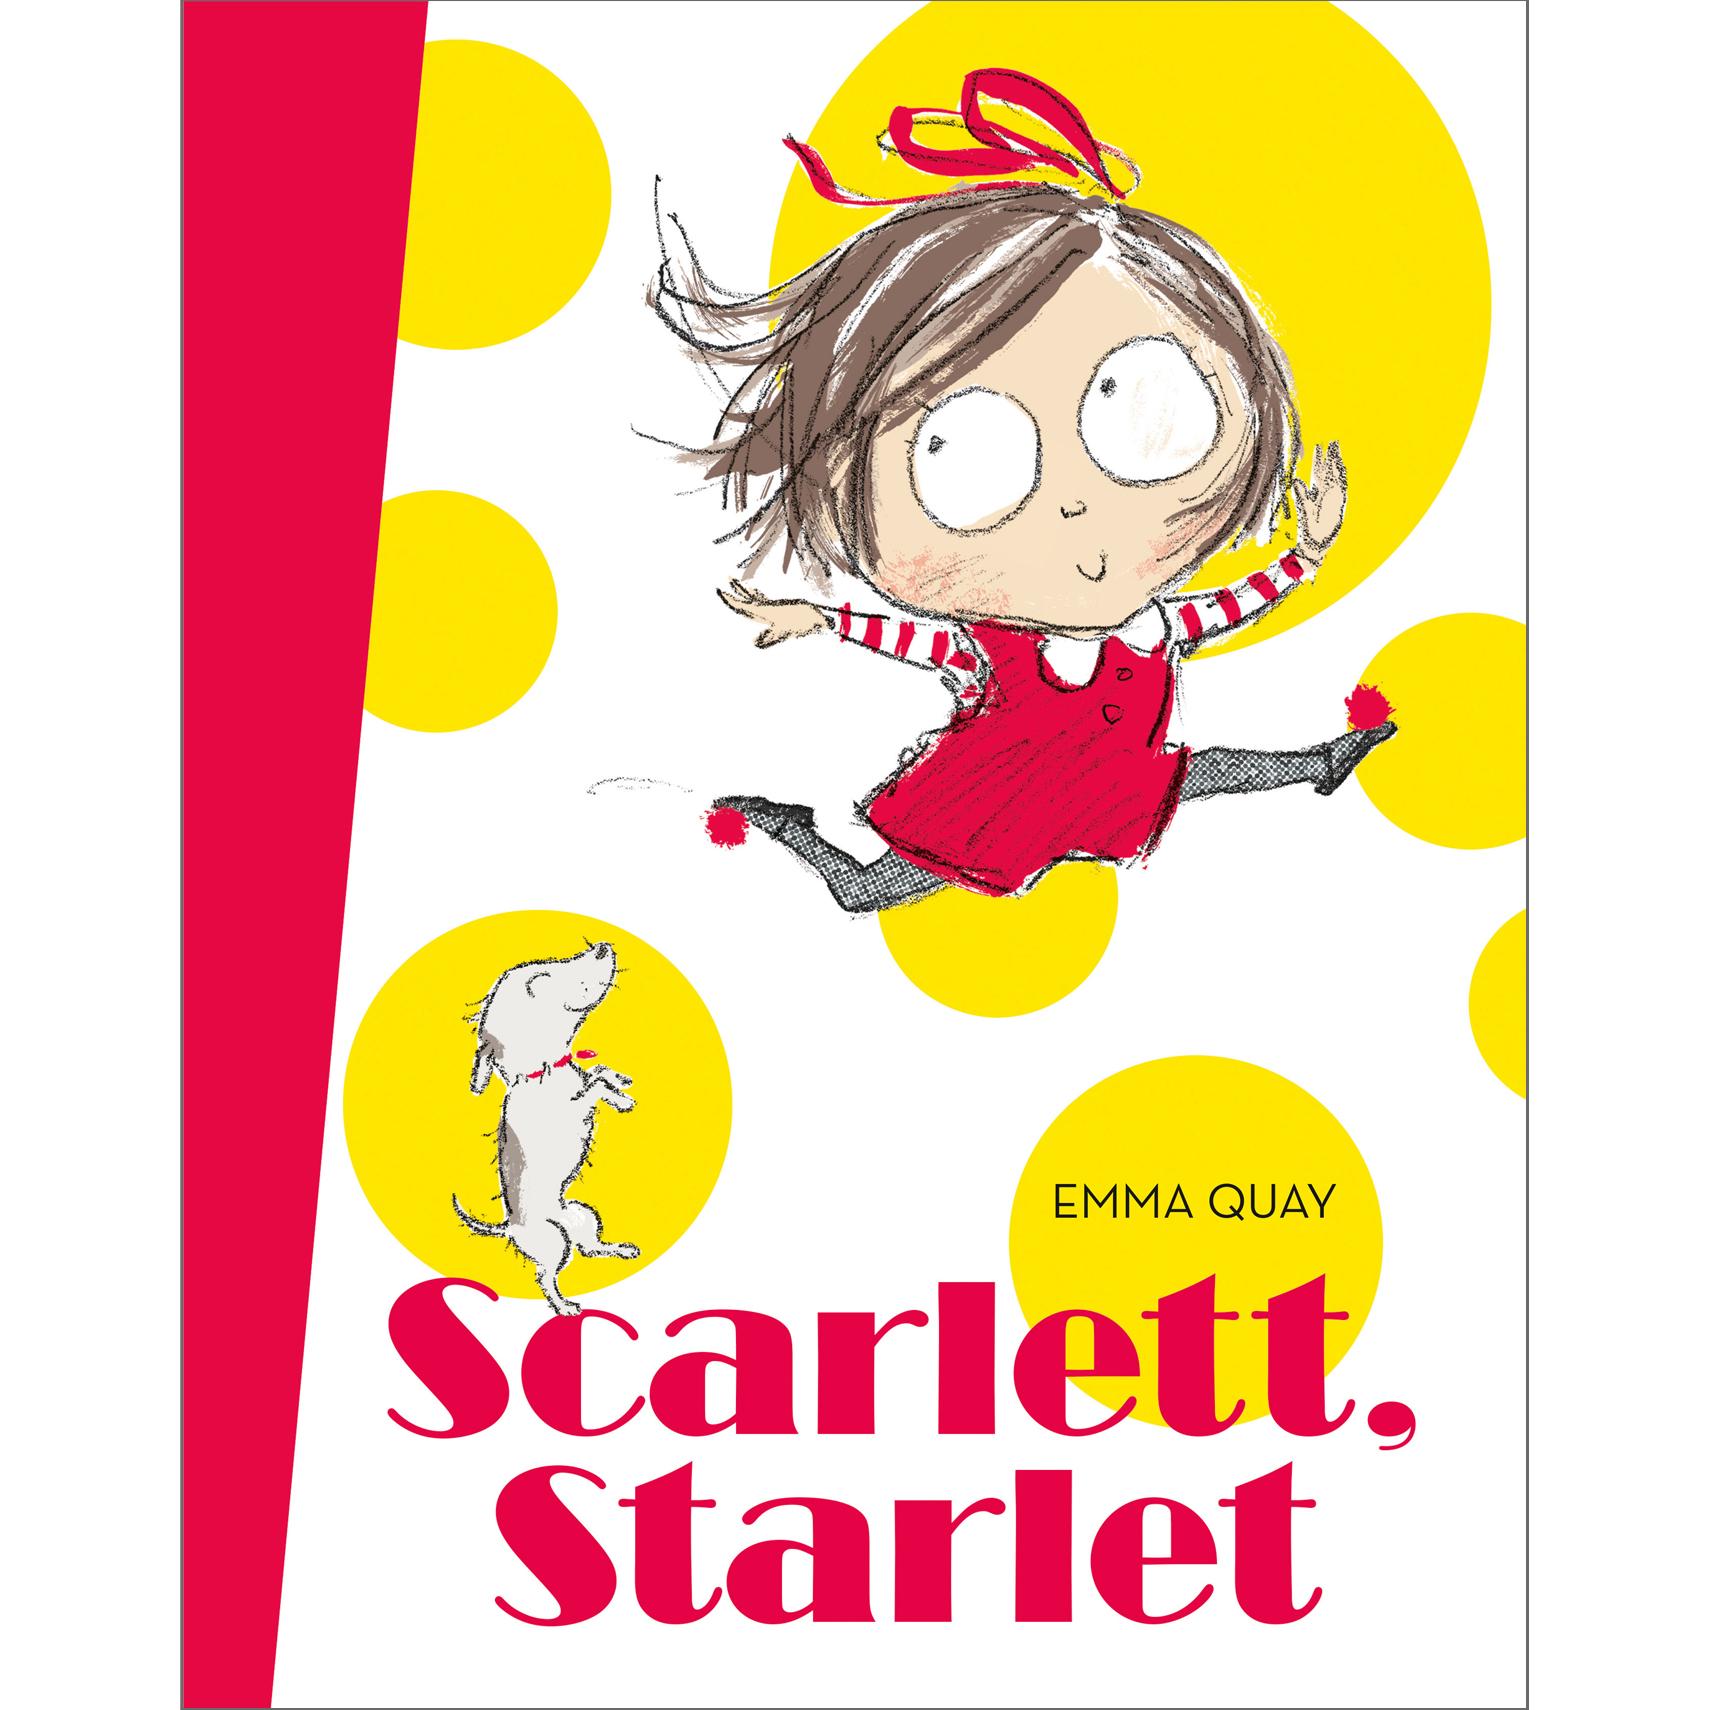 SCARLETT, STARLET by Emma Quay (ABC Books)